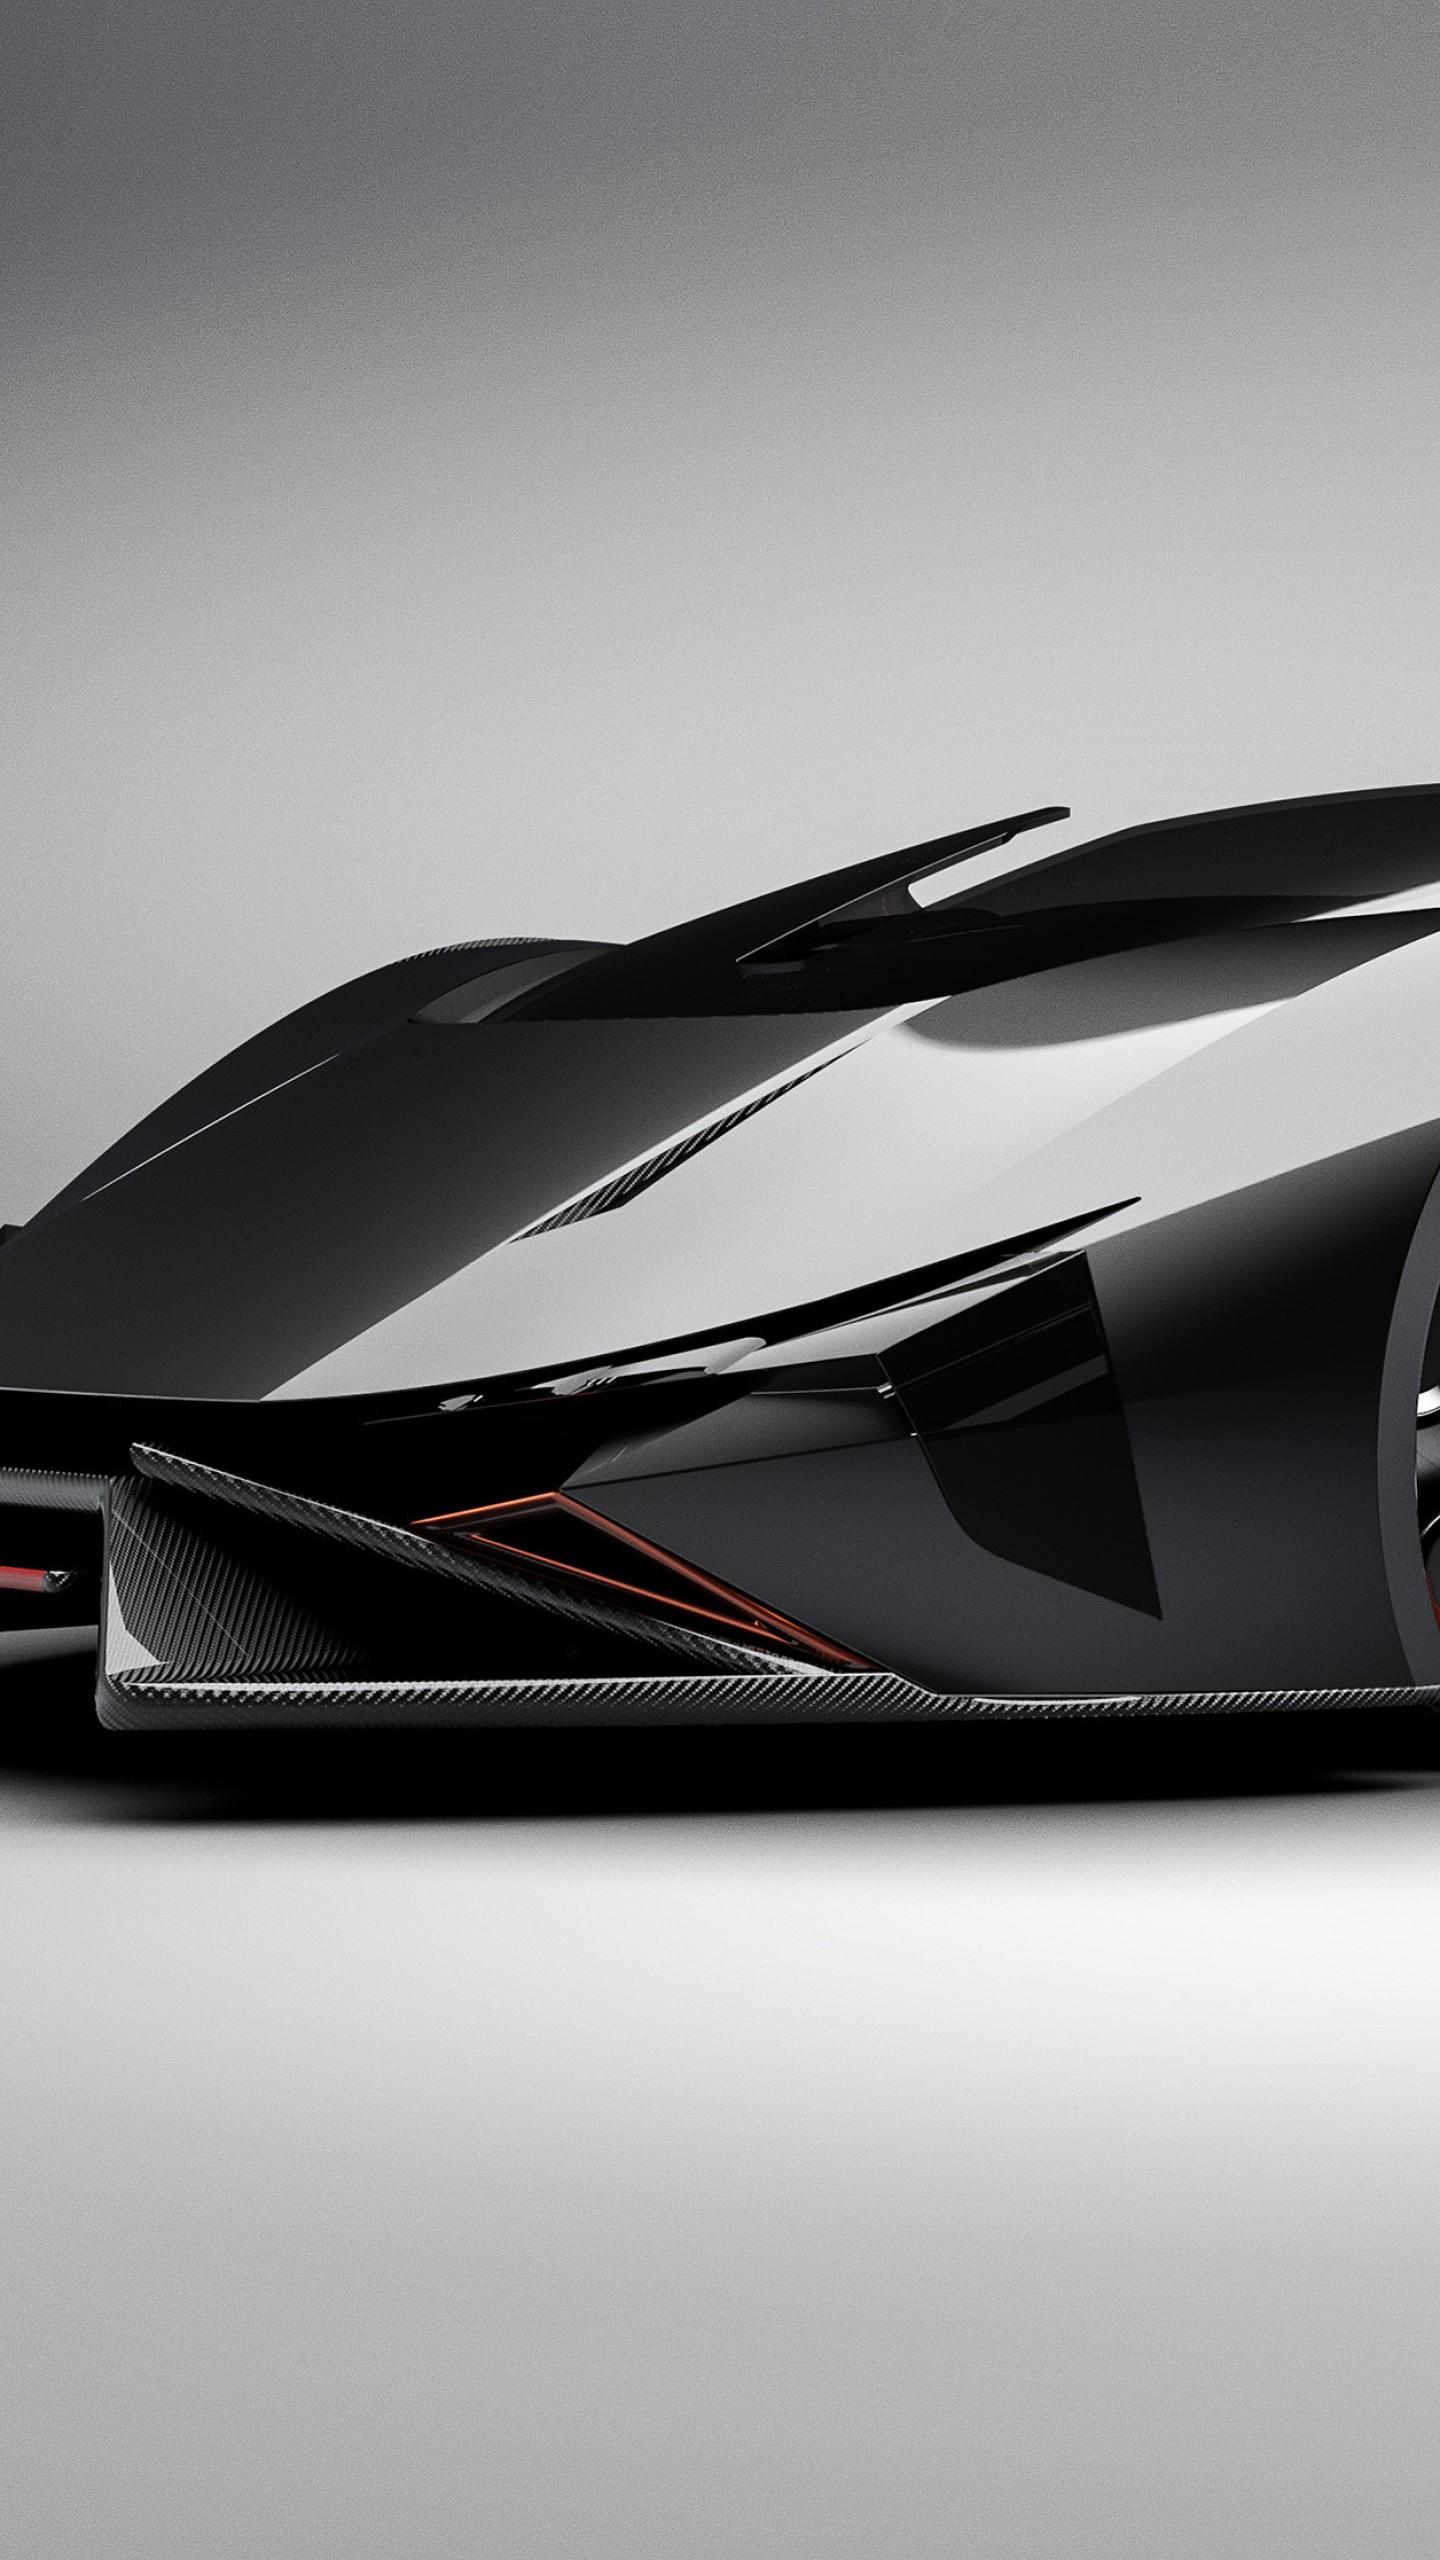 Wallpaper Lamborghini Diamante Electric Cars Concept 4k 3d Cars Bikes 14821 Page 858